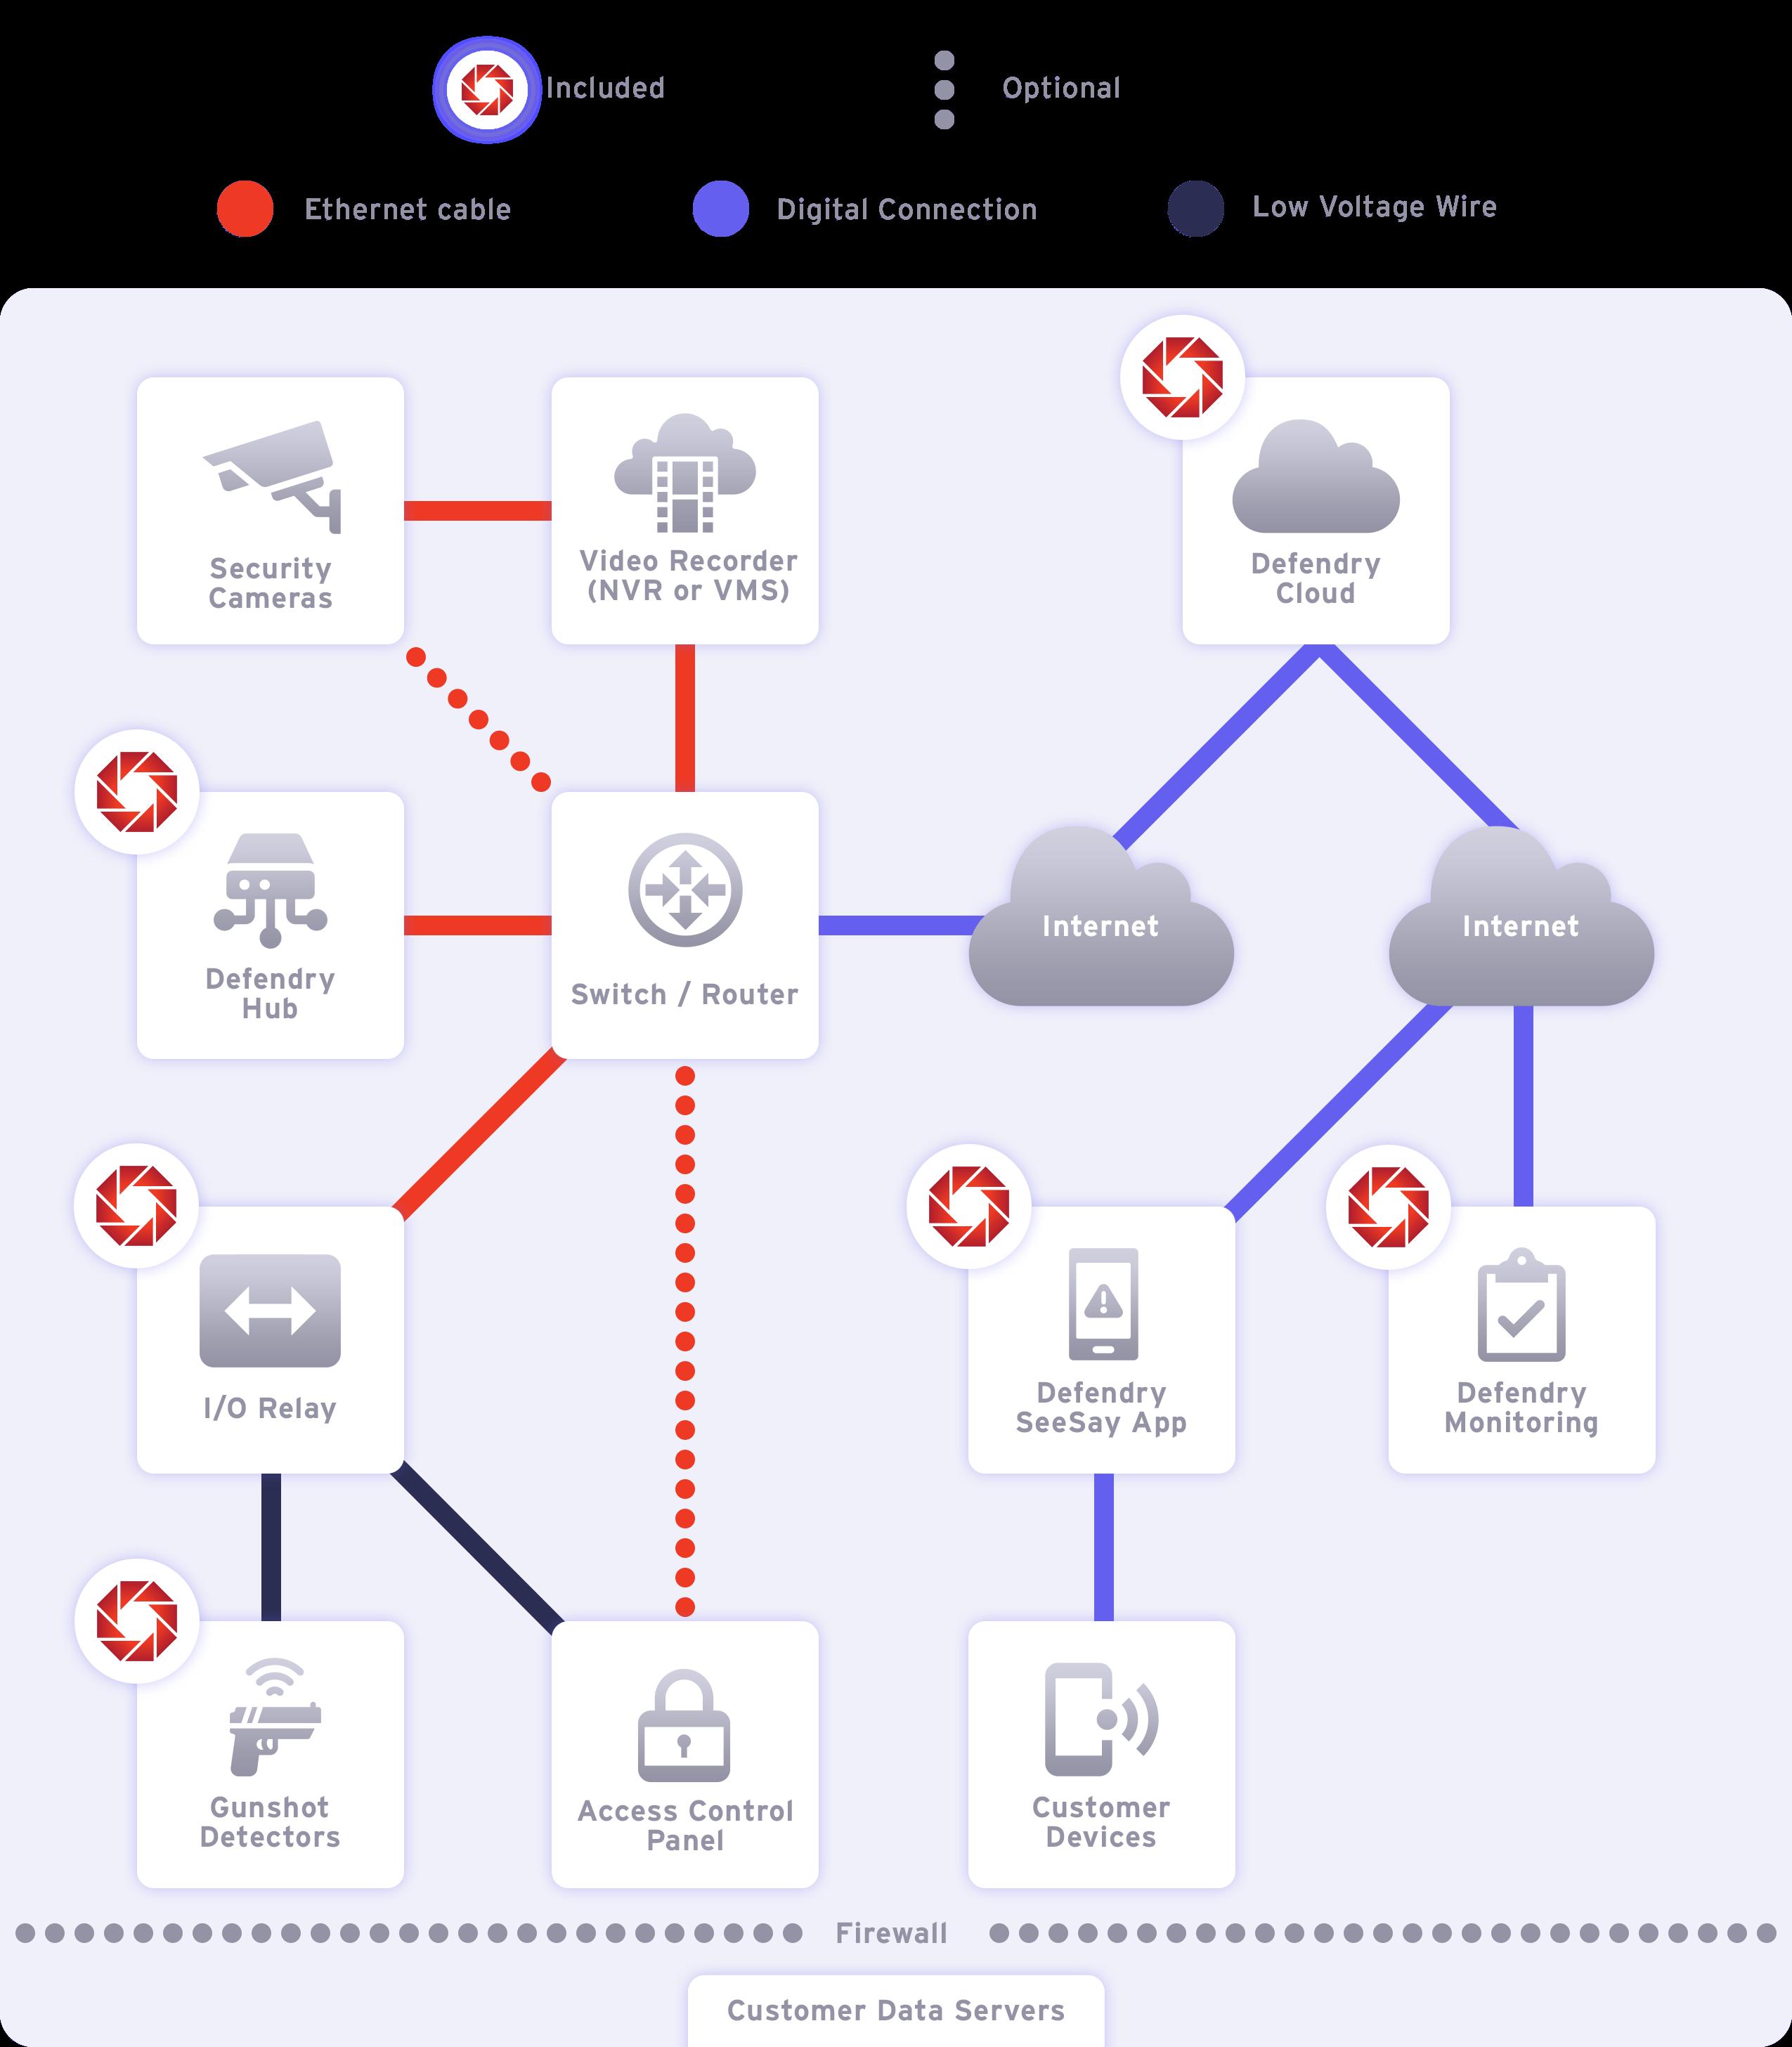 Defendry Alert System | Product Integration Map